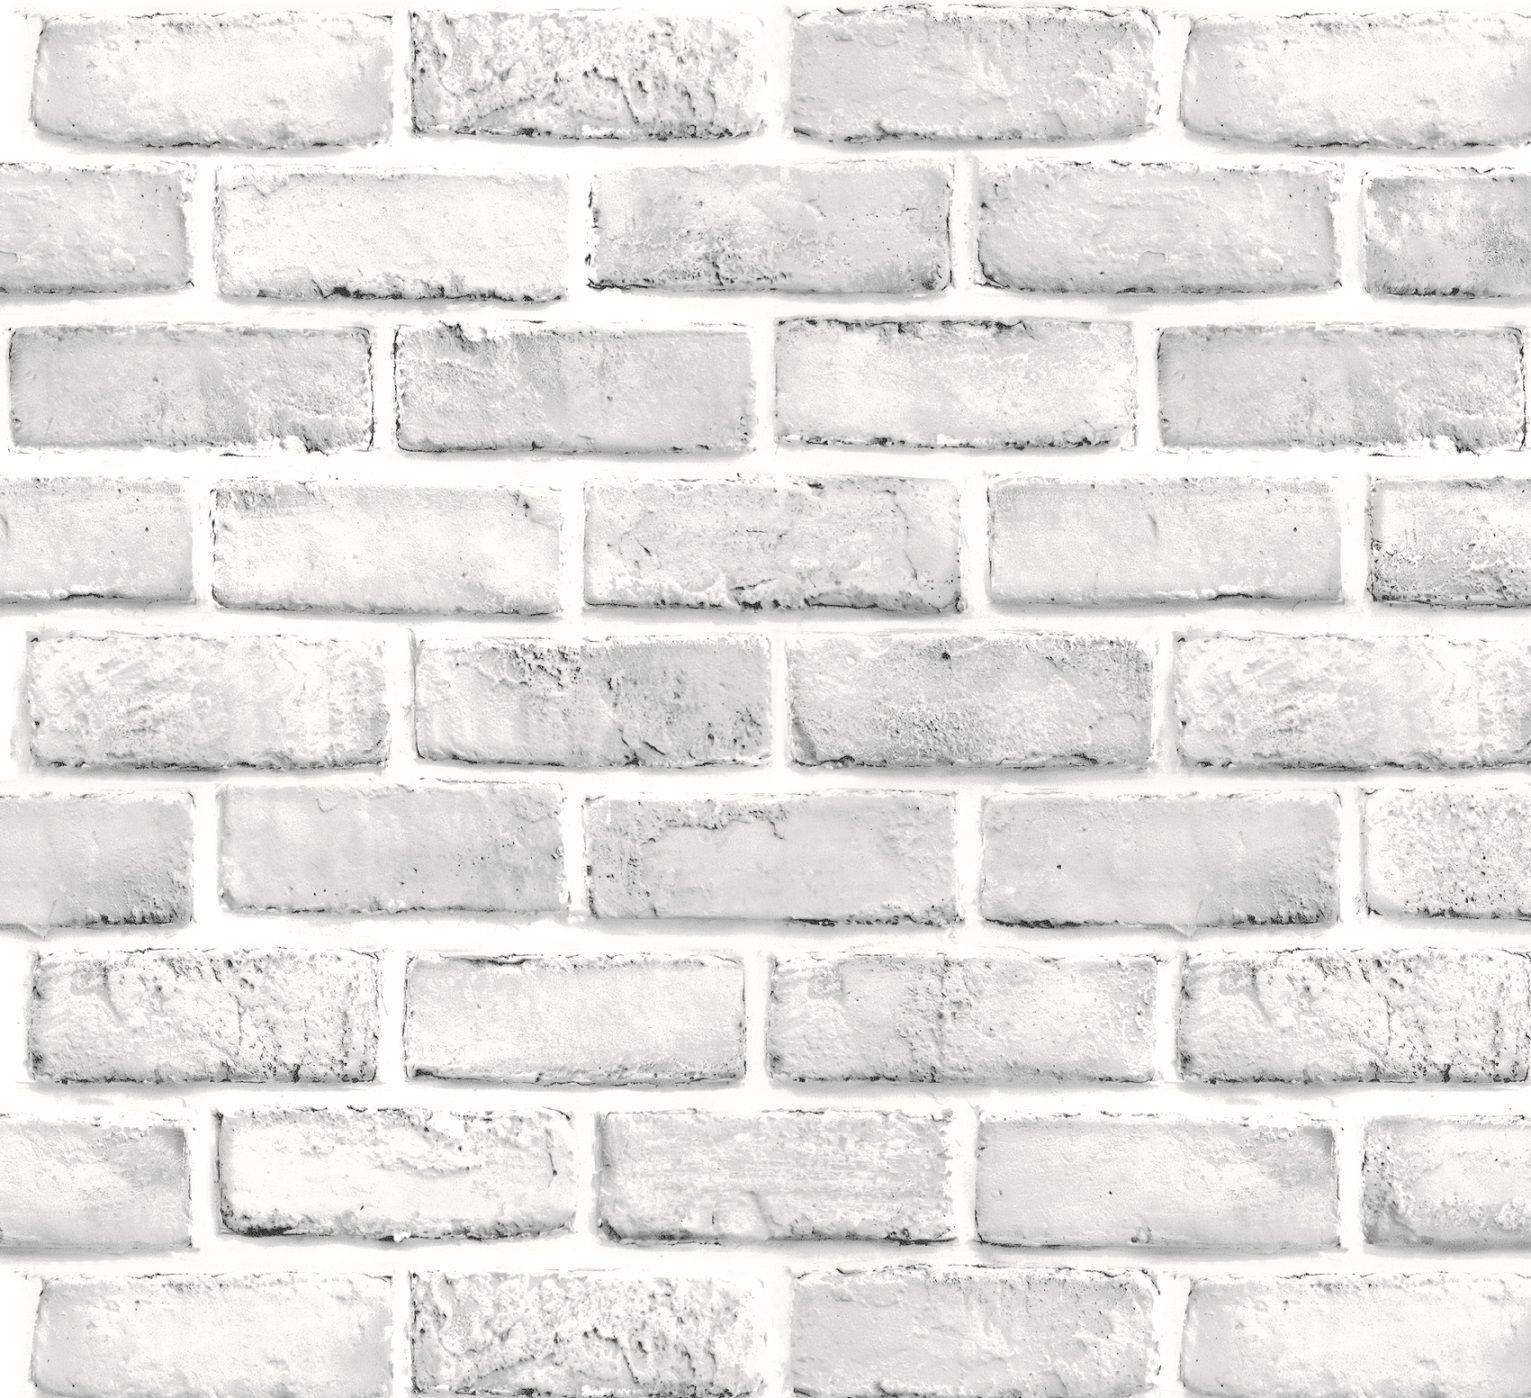 Papel Tapiz Ladrillos Blancos Autoadherible Pared Fondo De Pantalla De Ladrillo Ladrillos Blancos Papel Tapiz